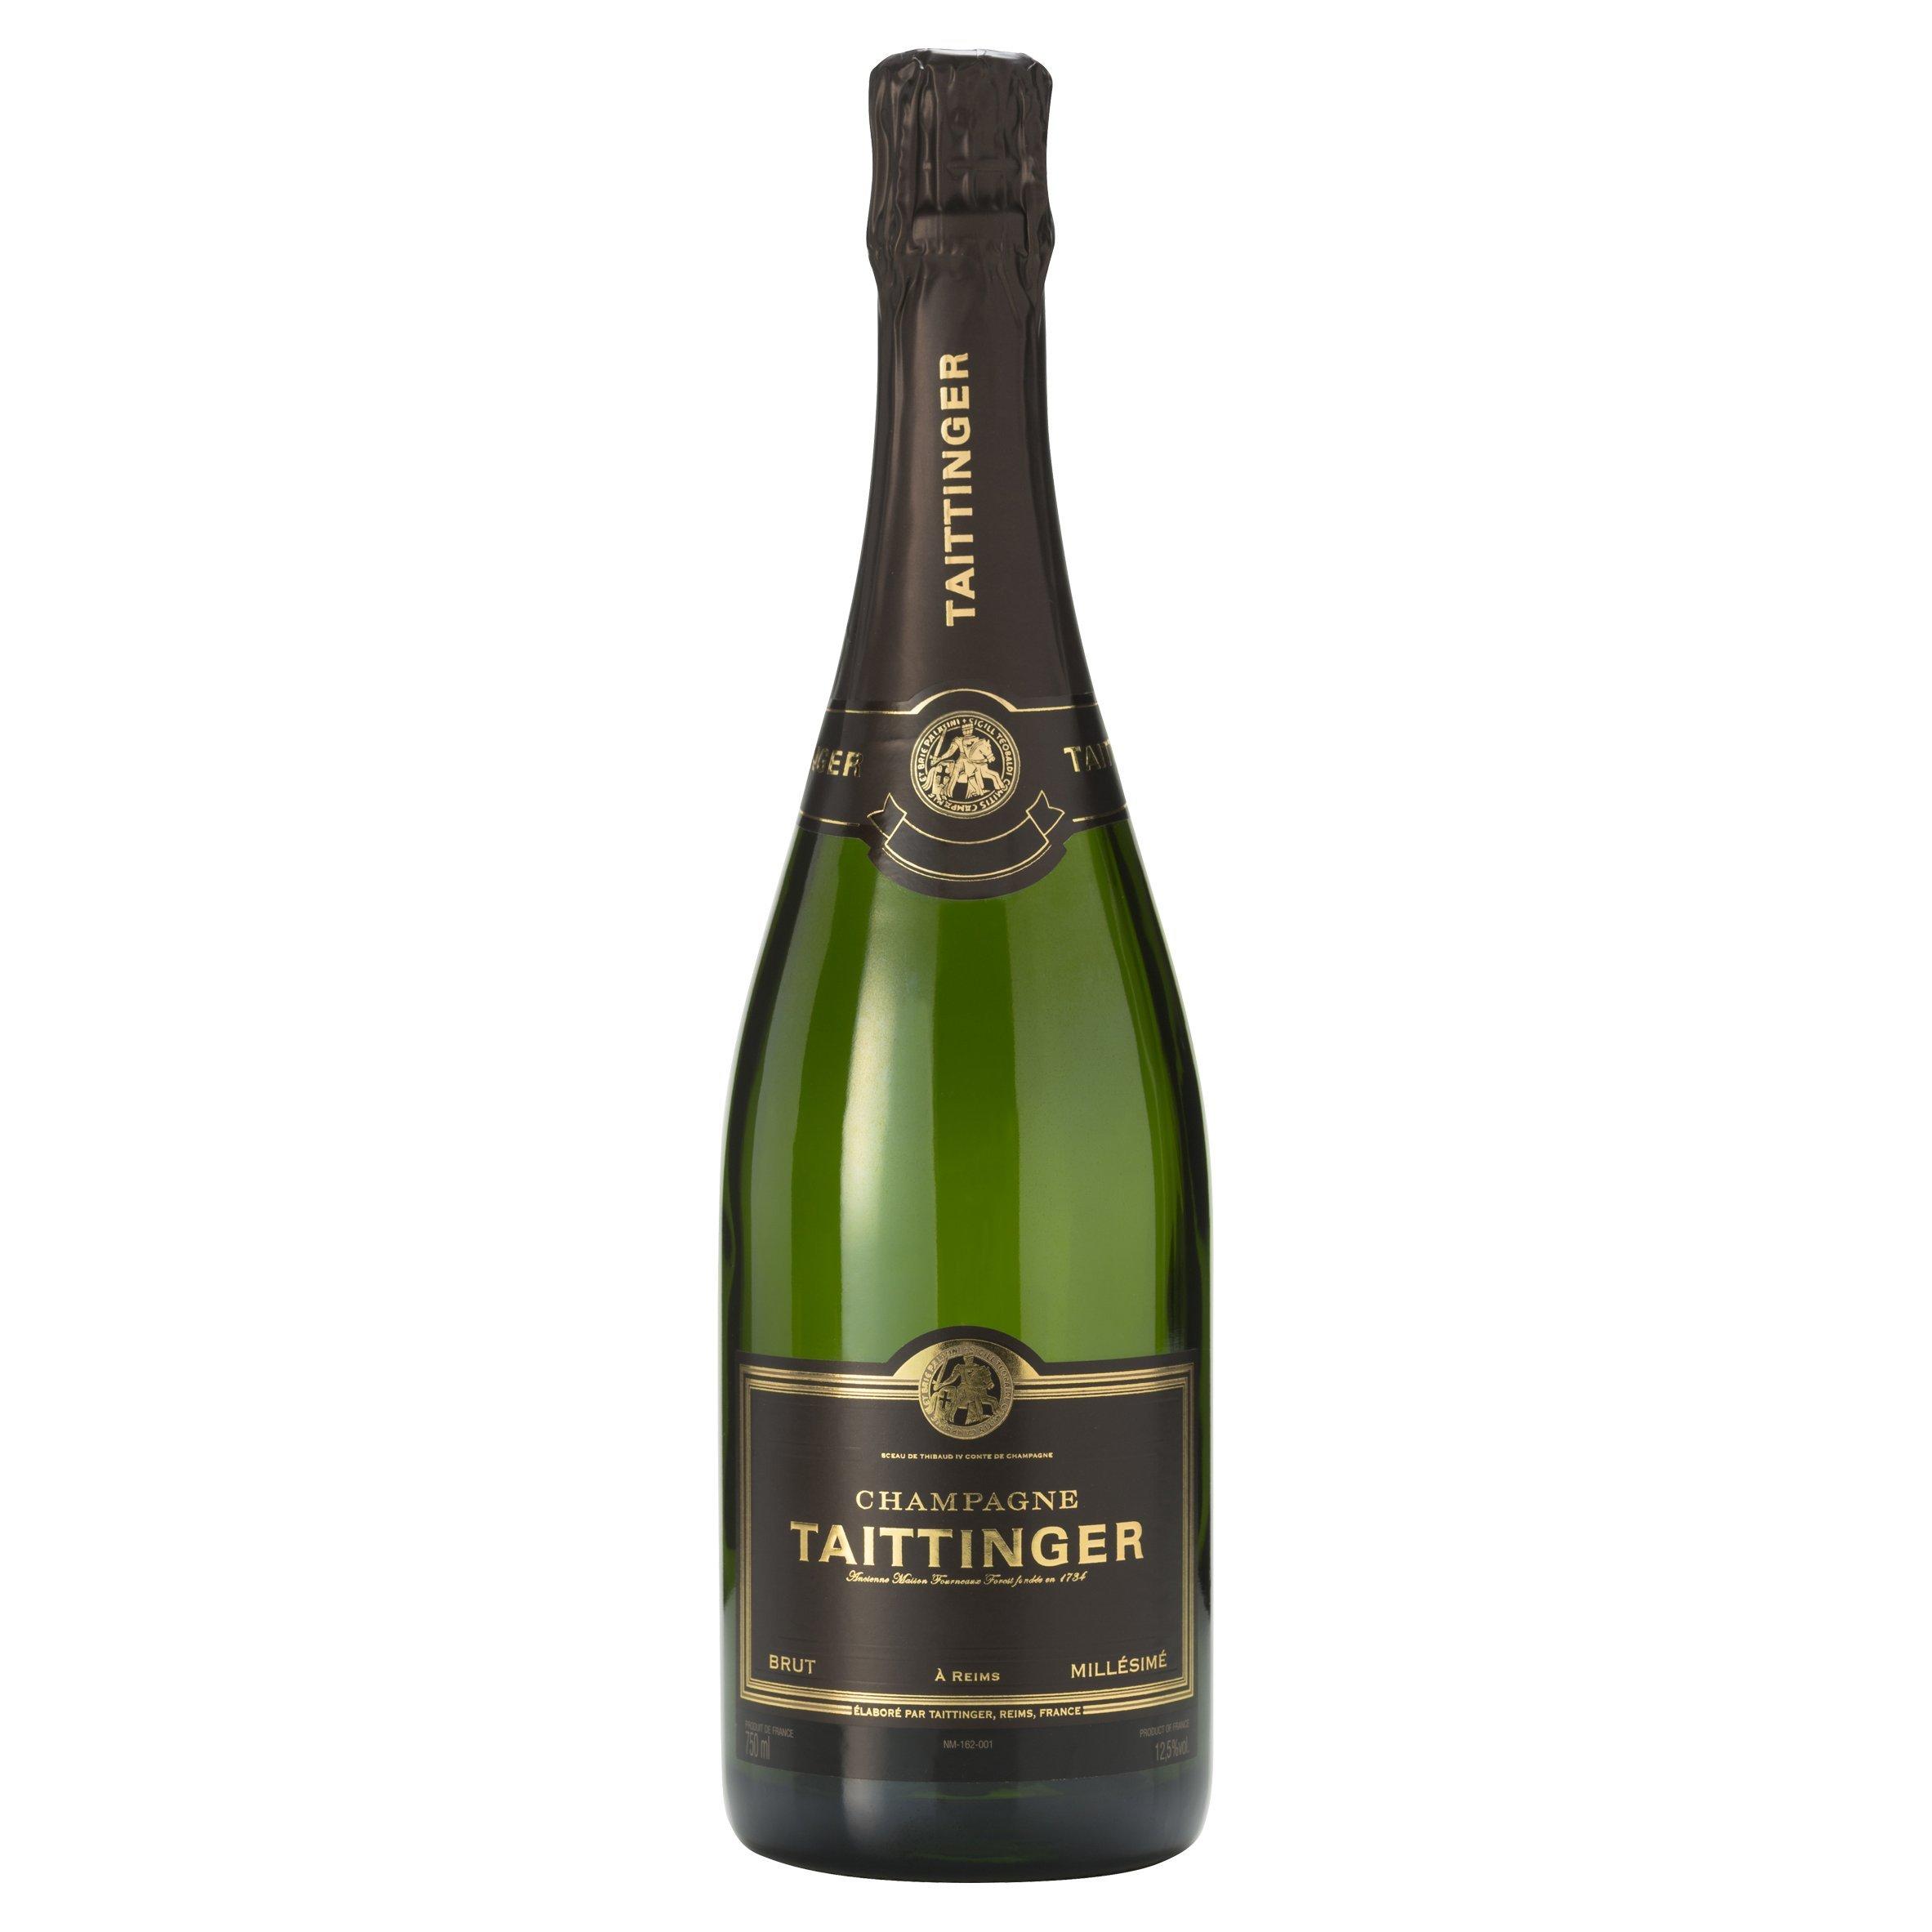 Taittinger Vintage Brut Champagne 2009, 75cl